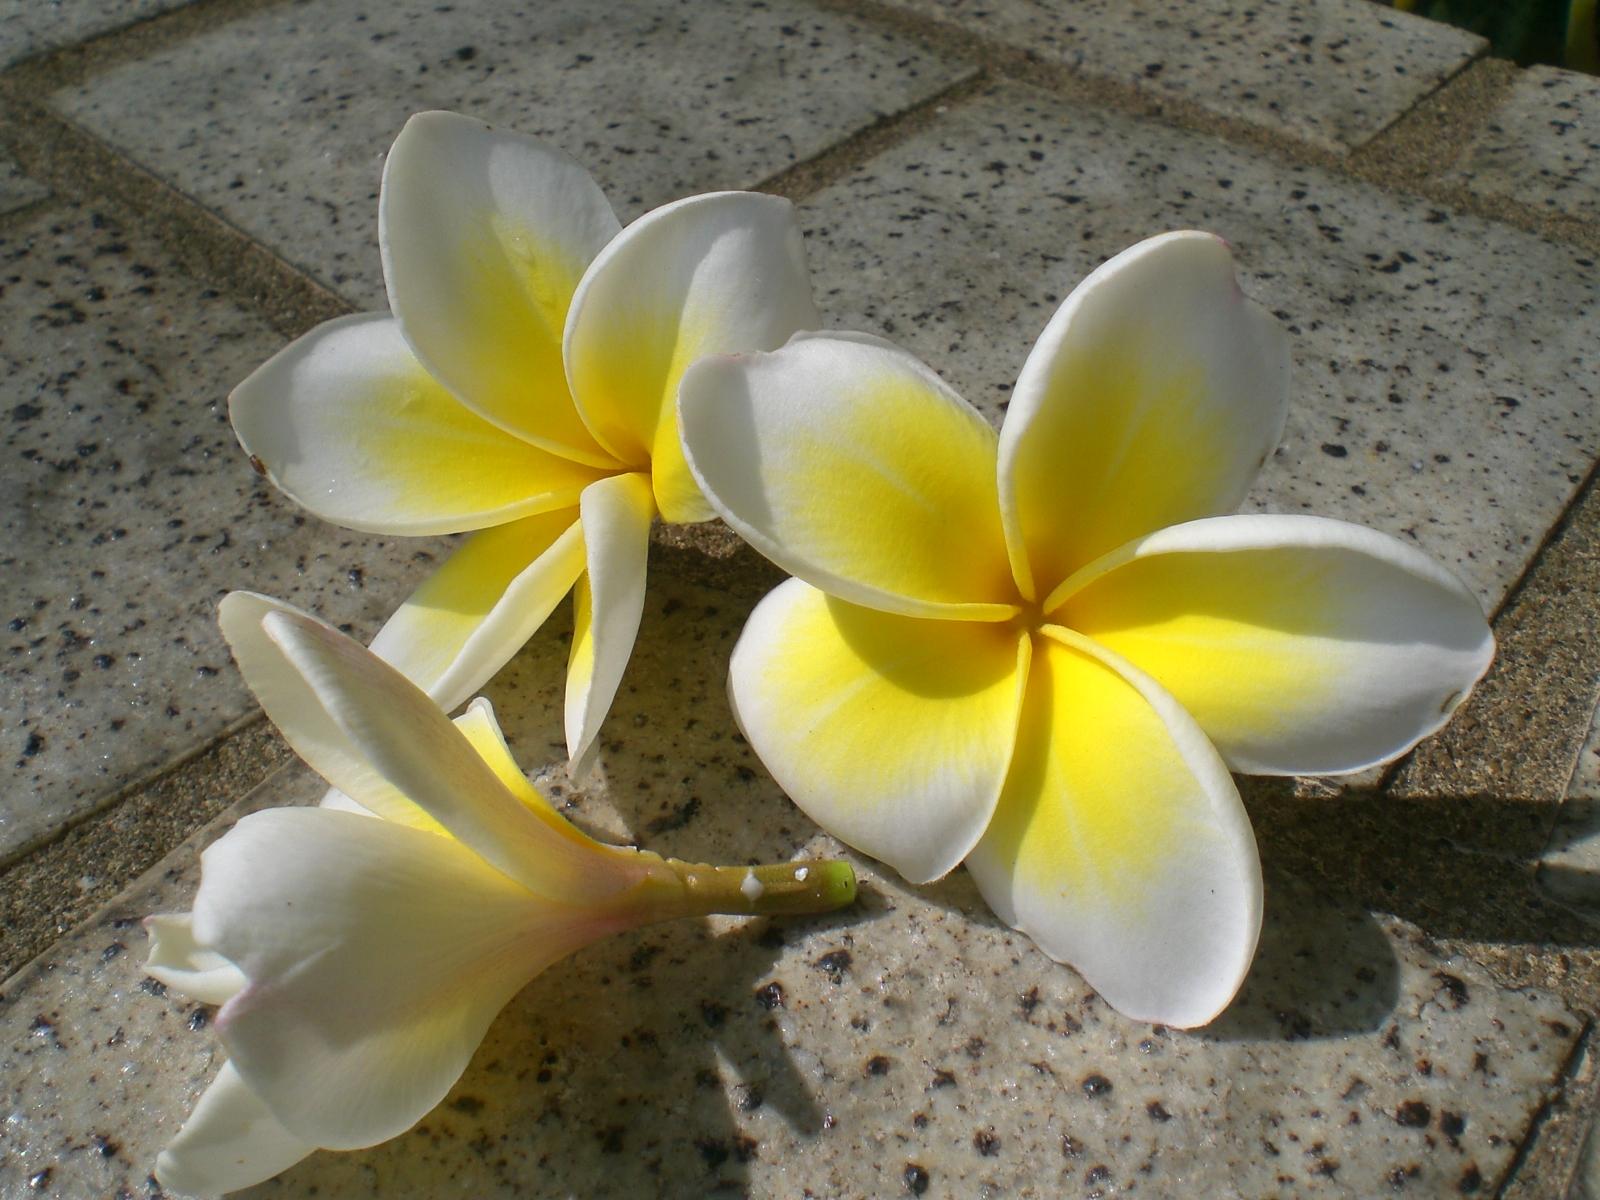 HK_Sunday_Wan_Chai_Park_White_Flowers_Plumeria - Please Pray for My Friend Robert Matson - Obituary